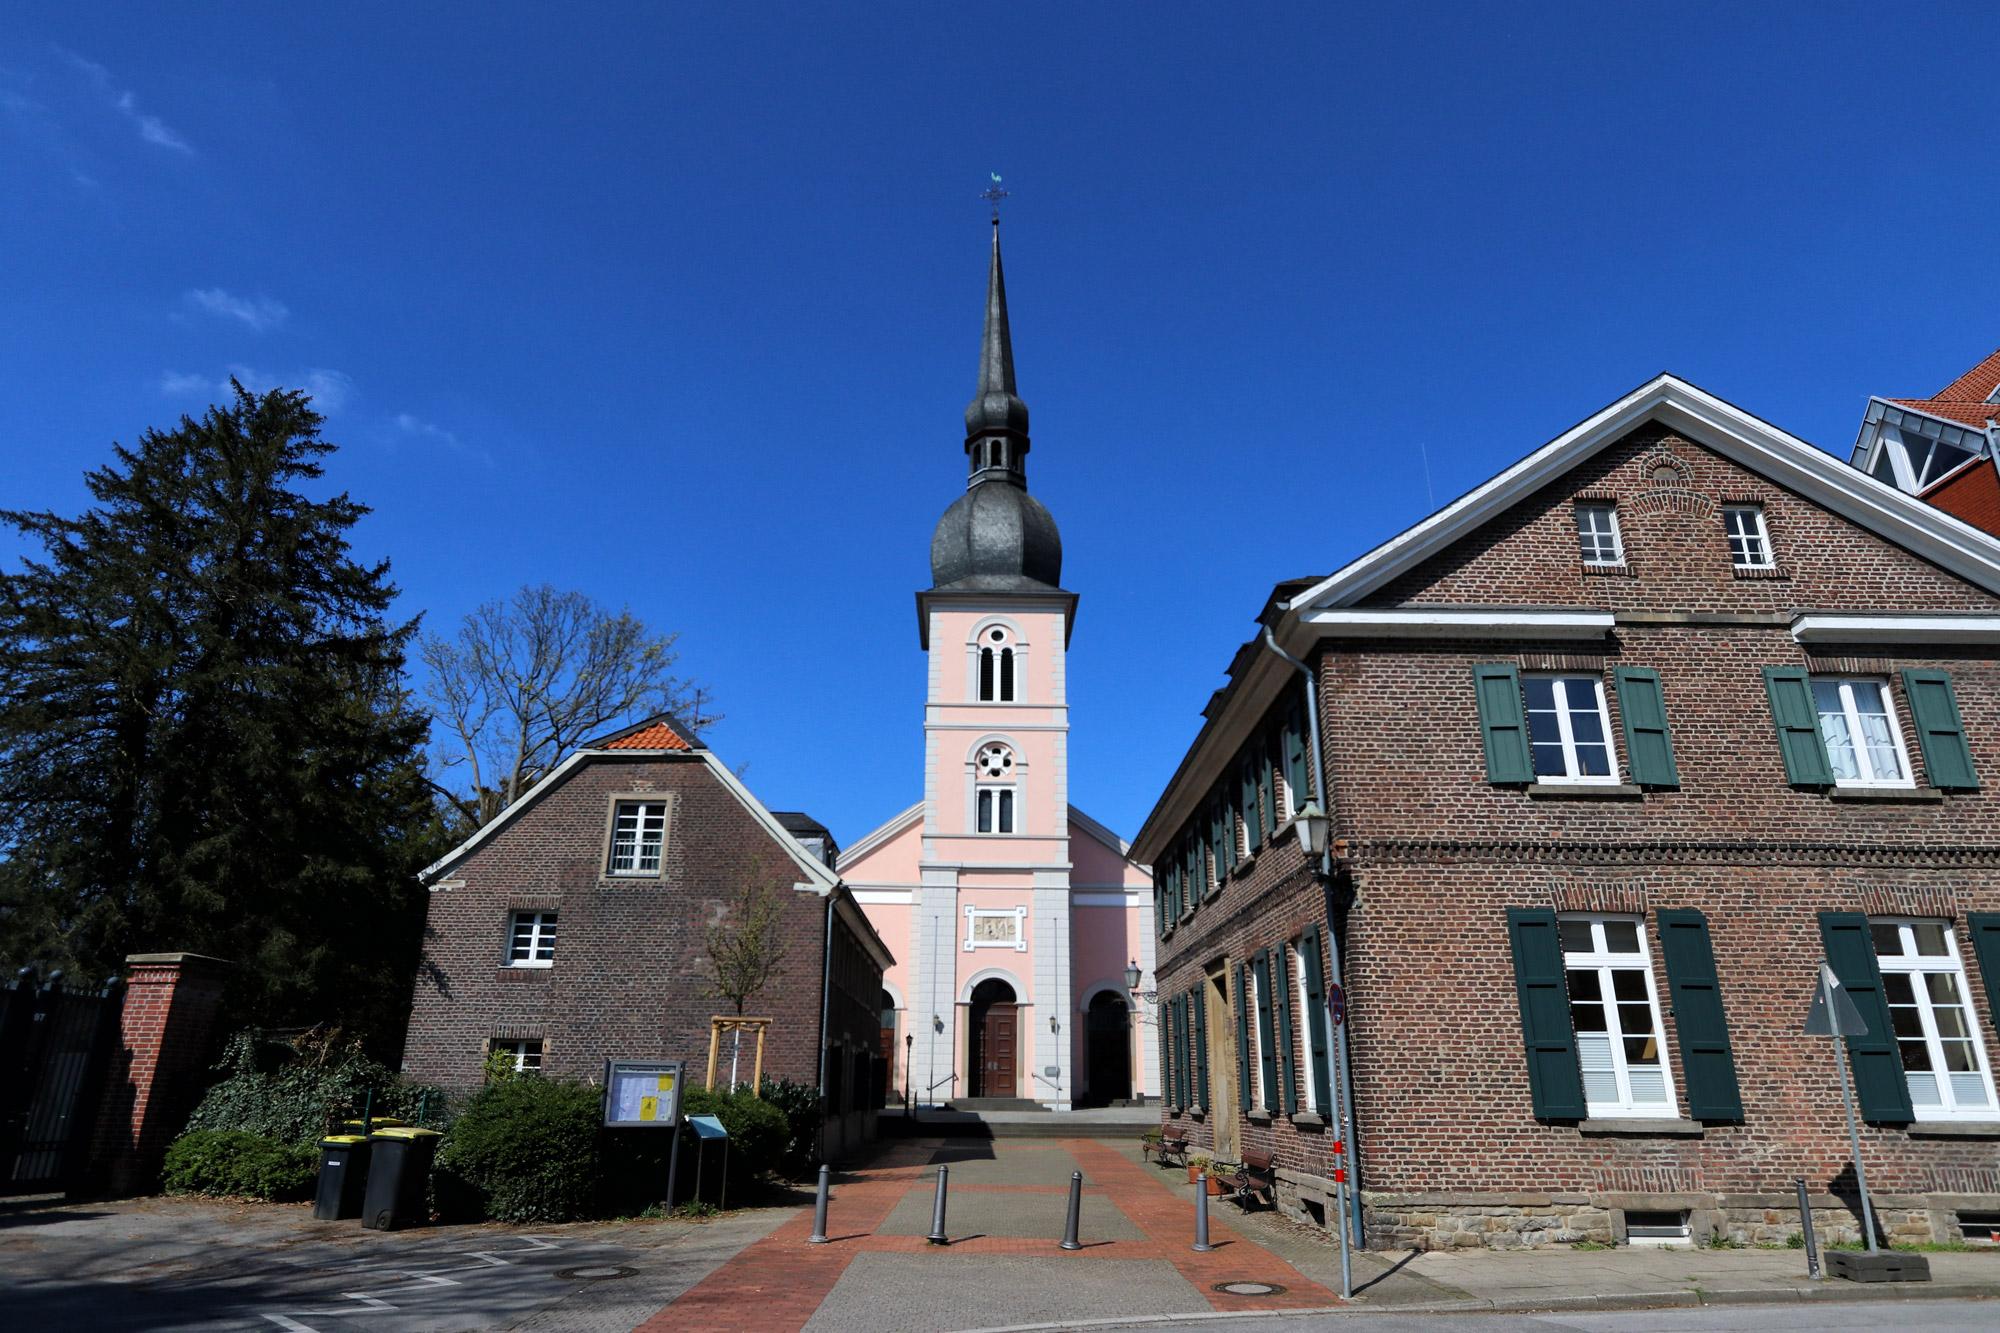 Essen-Kettwig - St. Peter Kirche